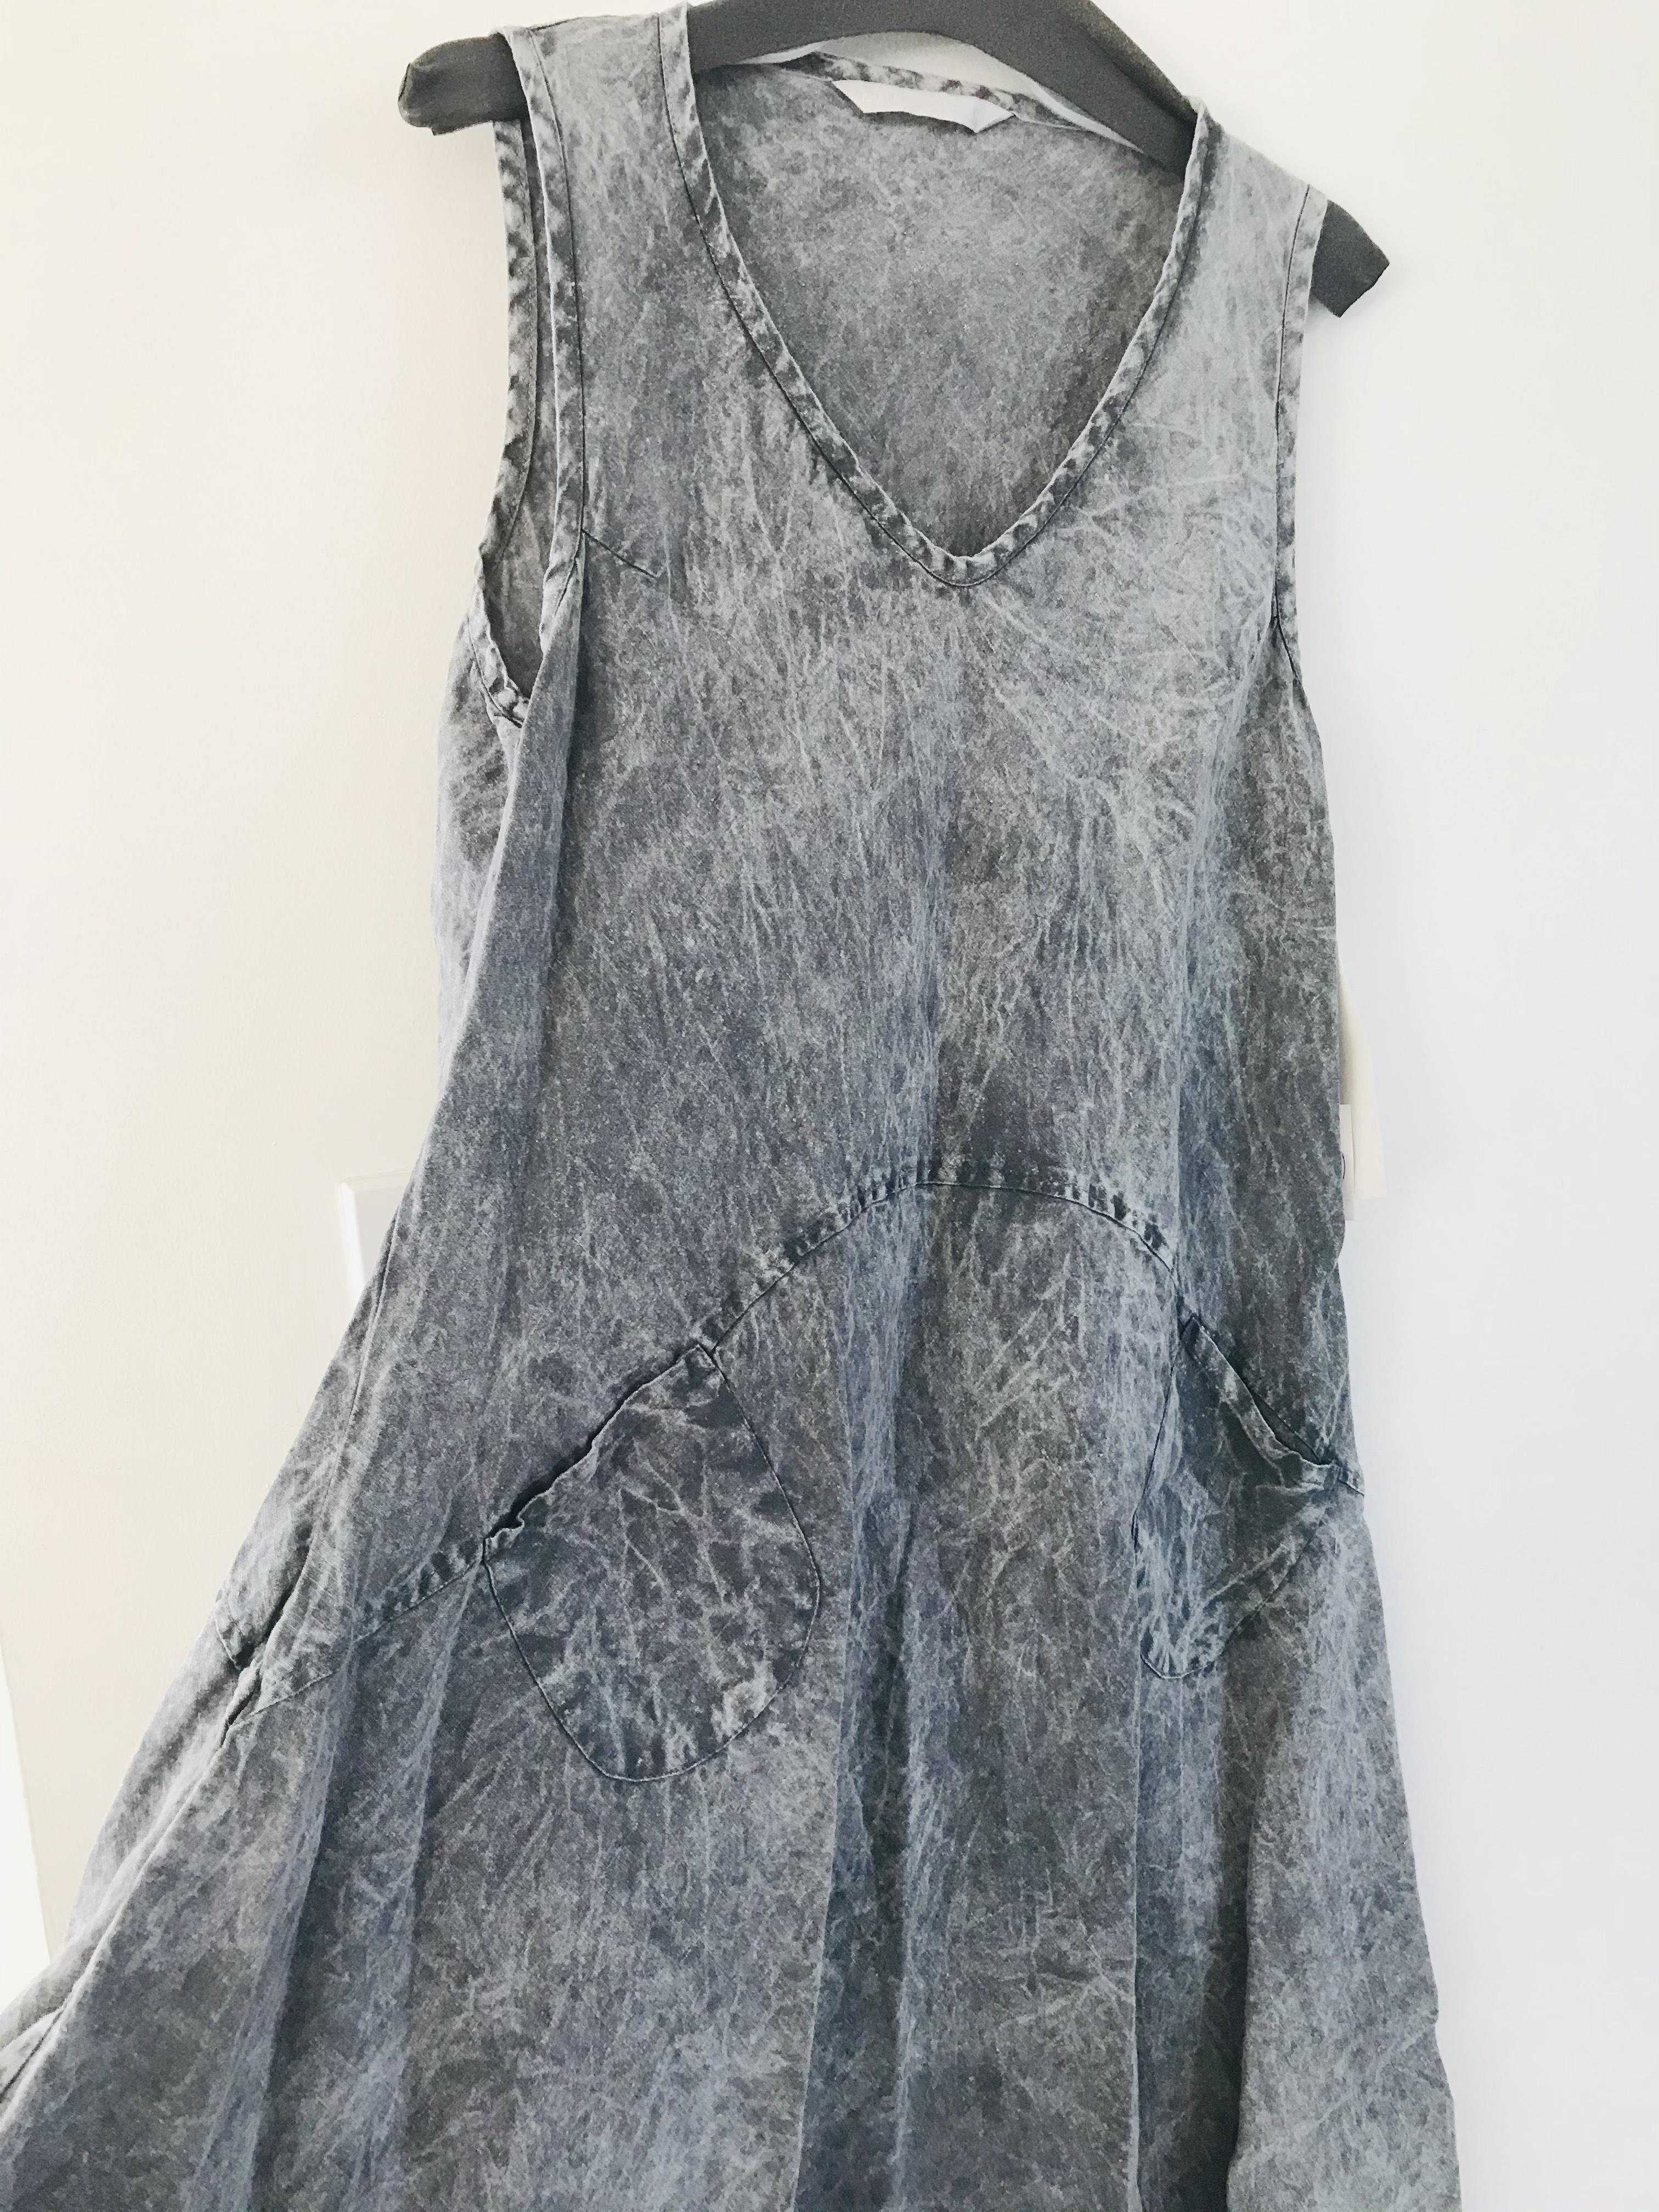 Luna Luz: Ribbed Linen A-Line Tie Dye Dress (Ships Immed in Grey Saltwash!) LLL_7769T_Grey_Saltwash